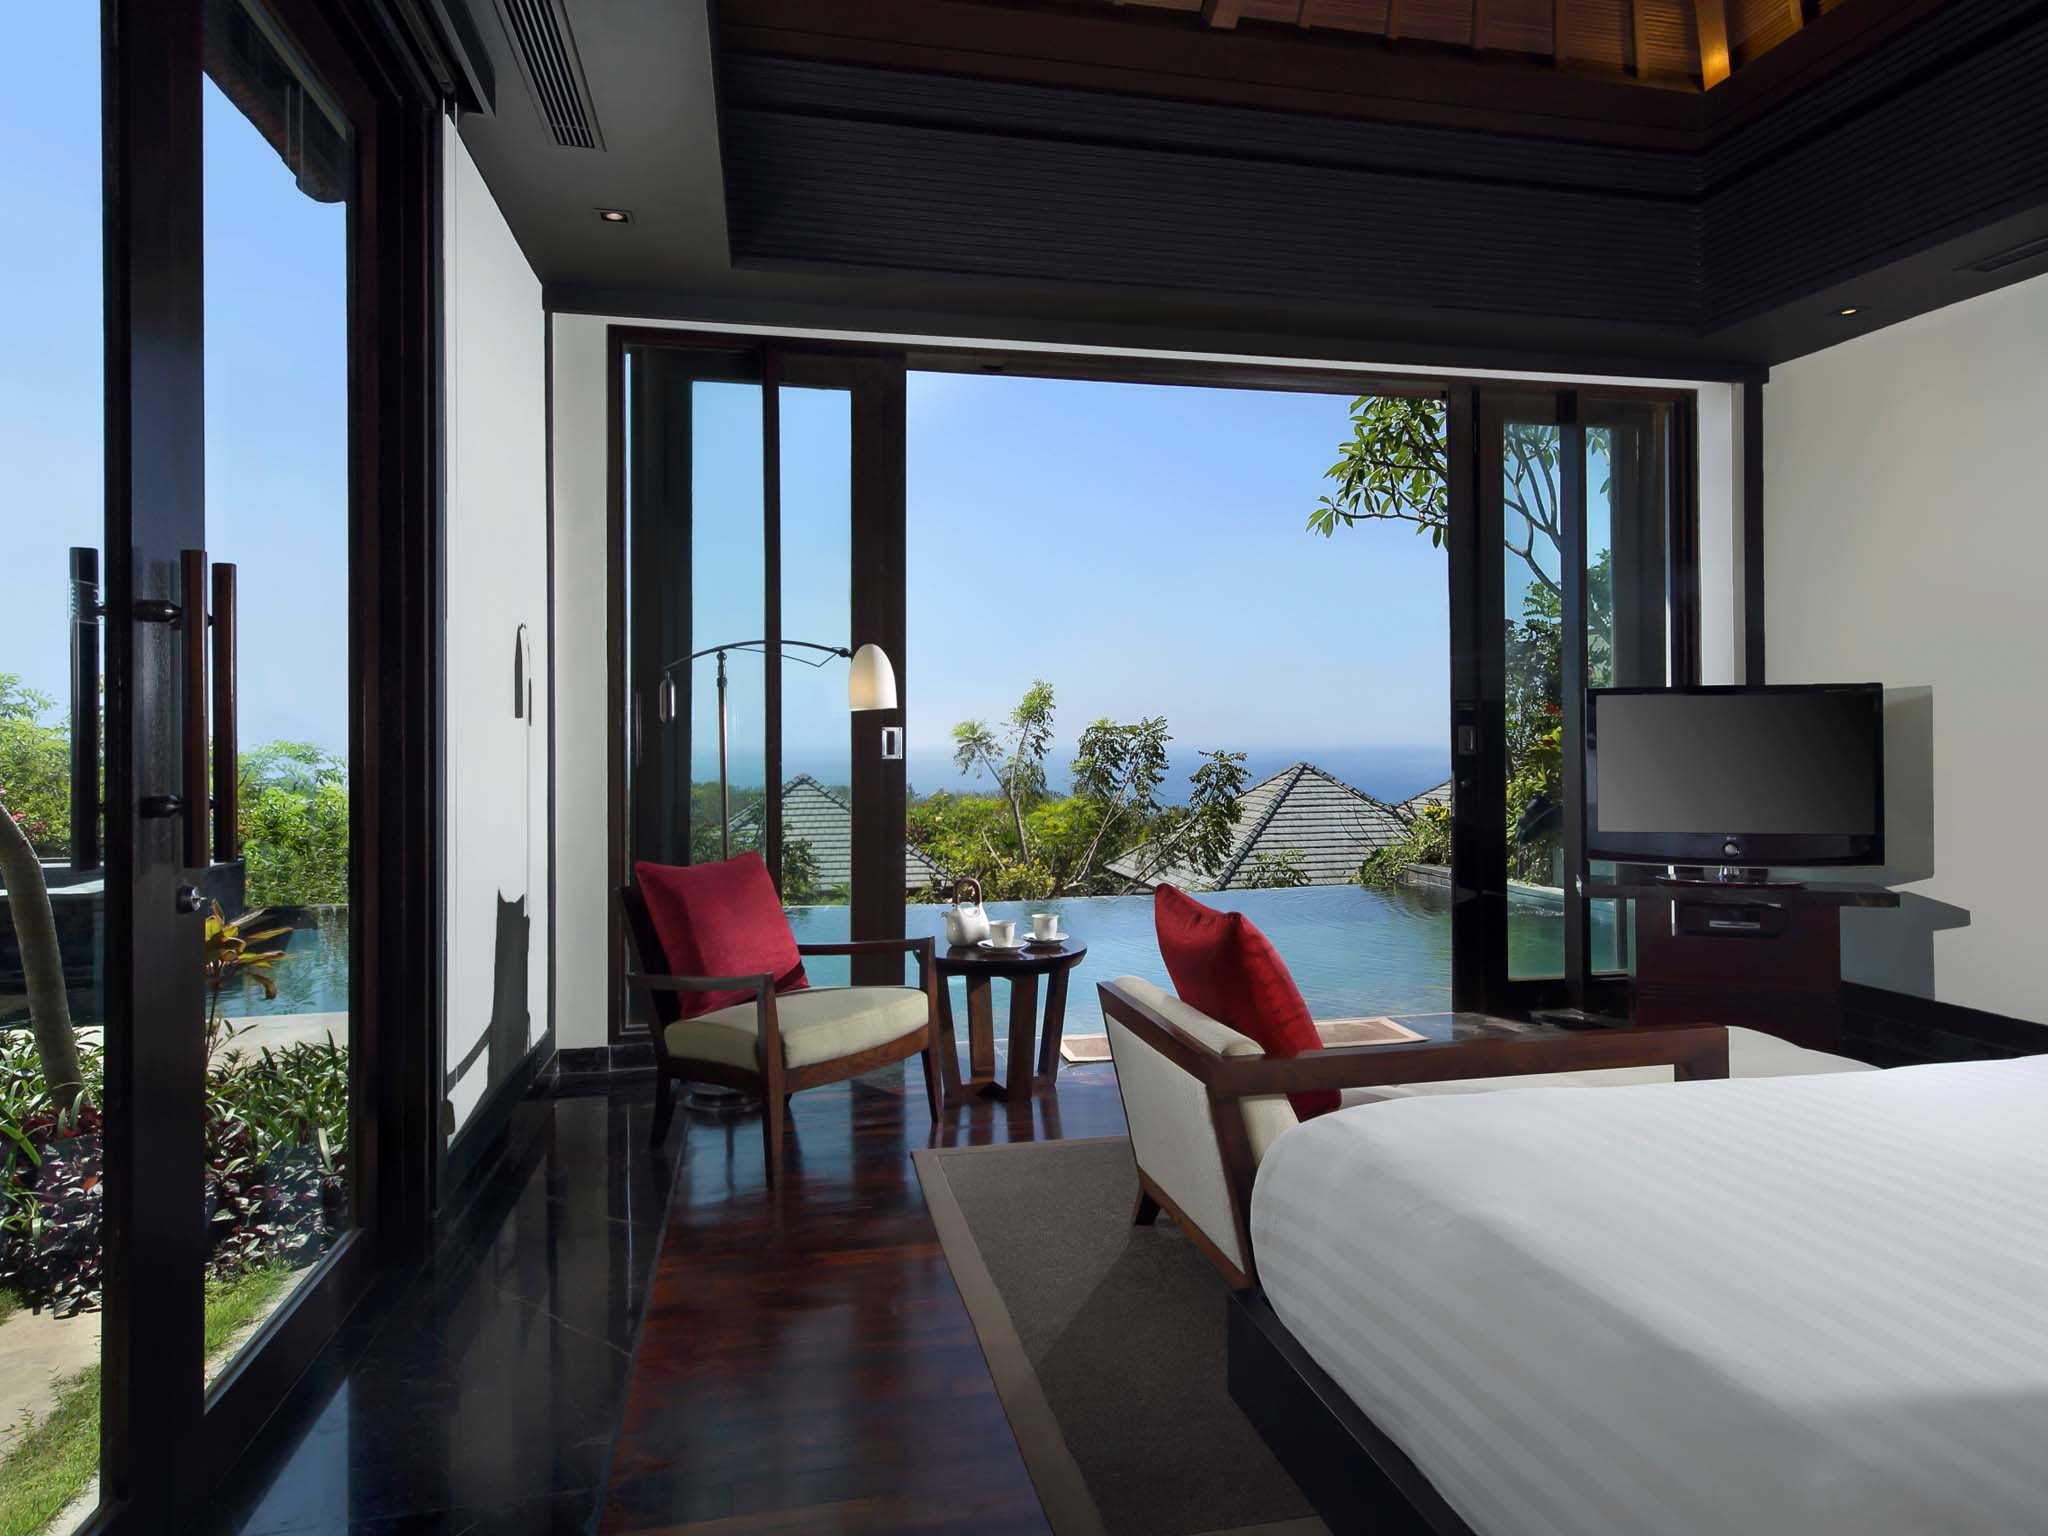 Hotel In Bali Banyan Tree Ungasan Bali